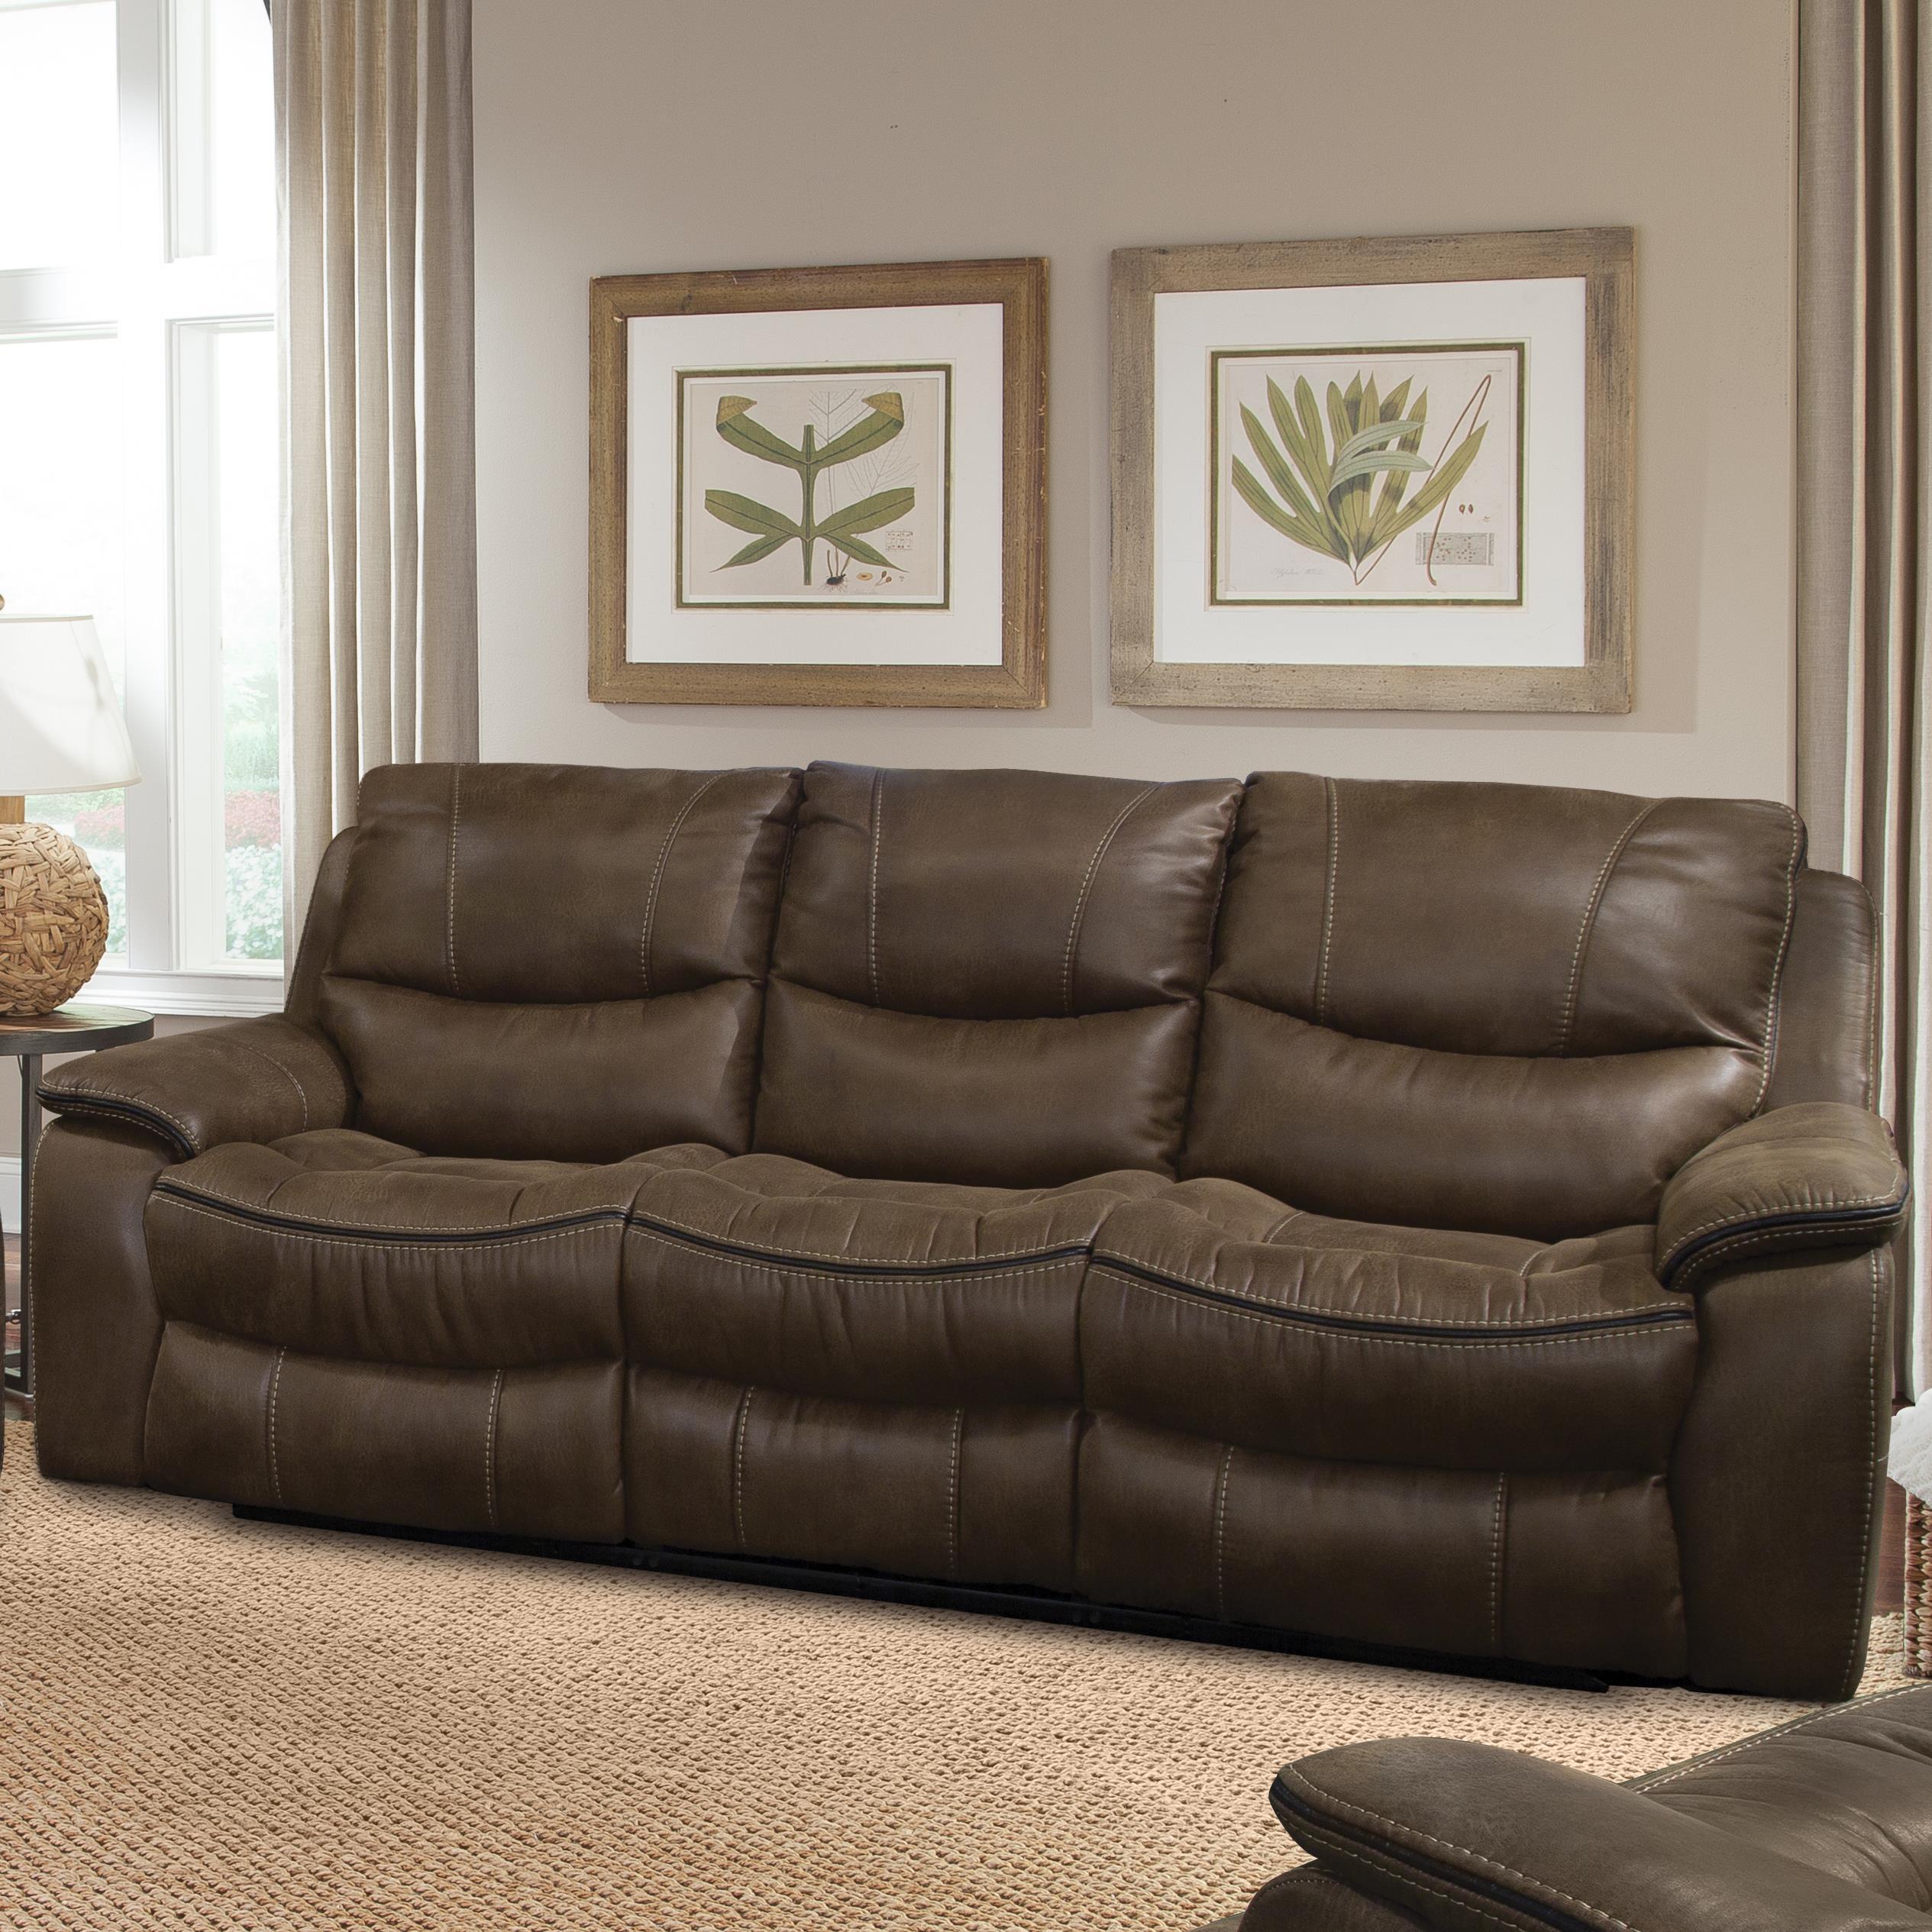 Parker Living Remus Casual Power Dual Recliner Sofa - Item Number: MREM-832P-ST